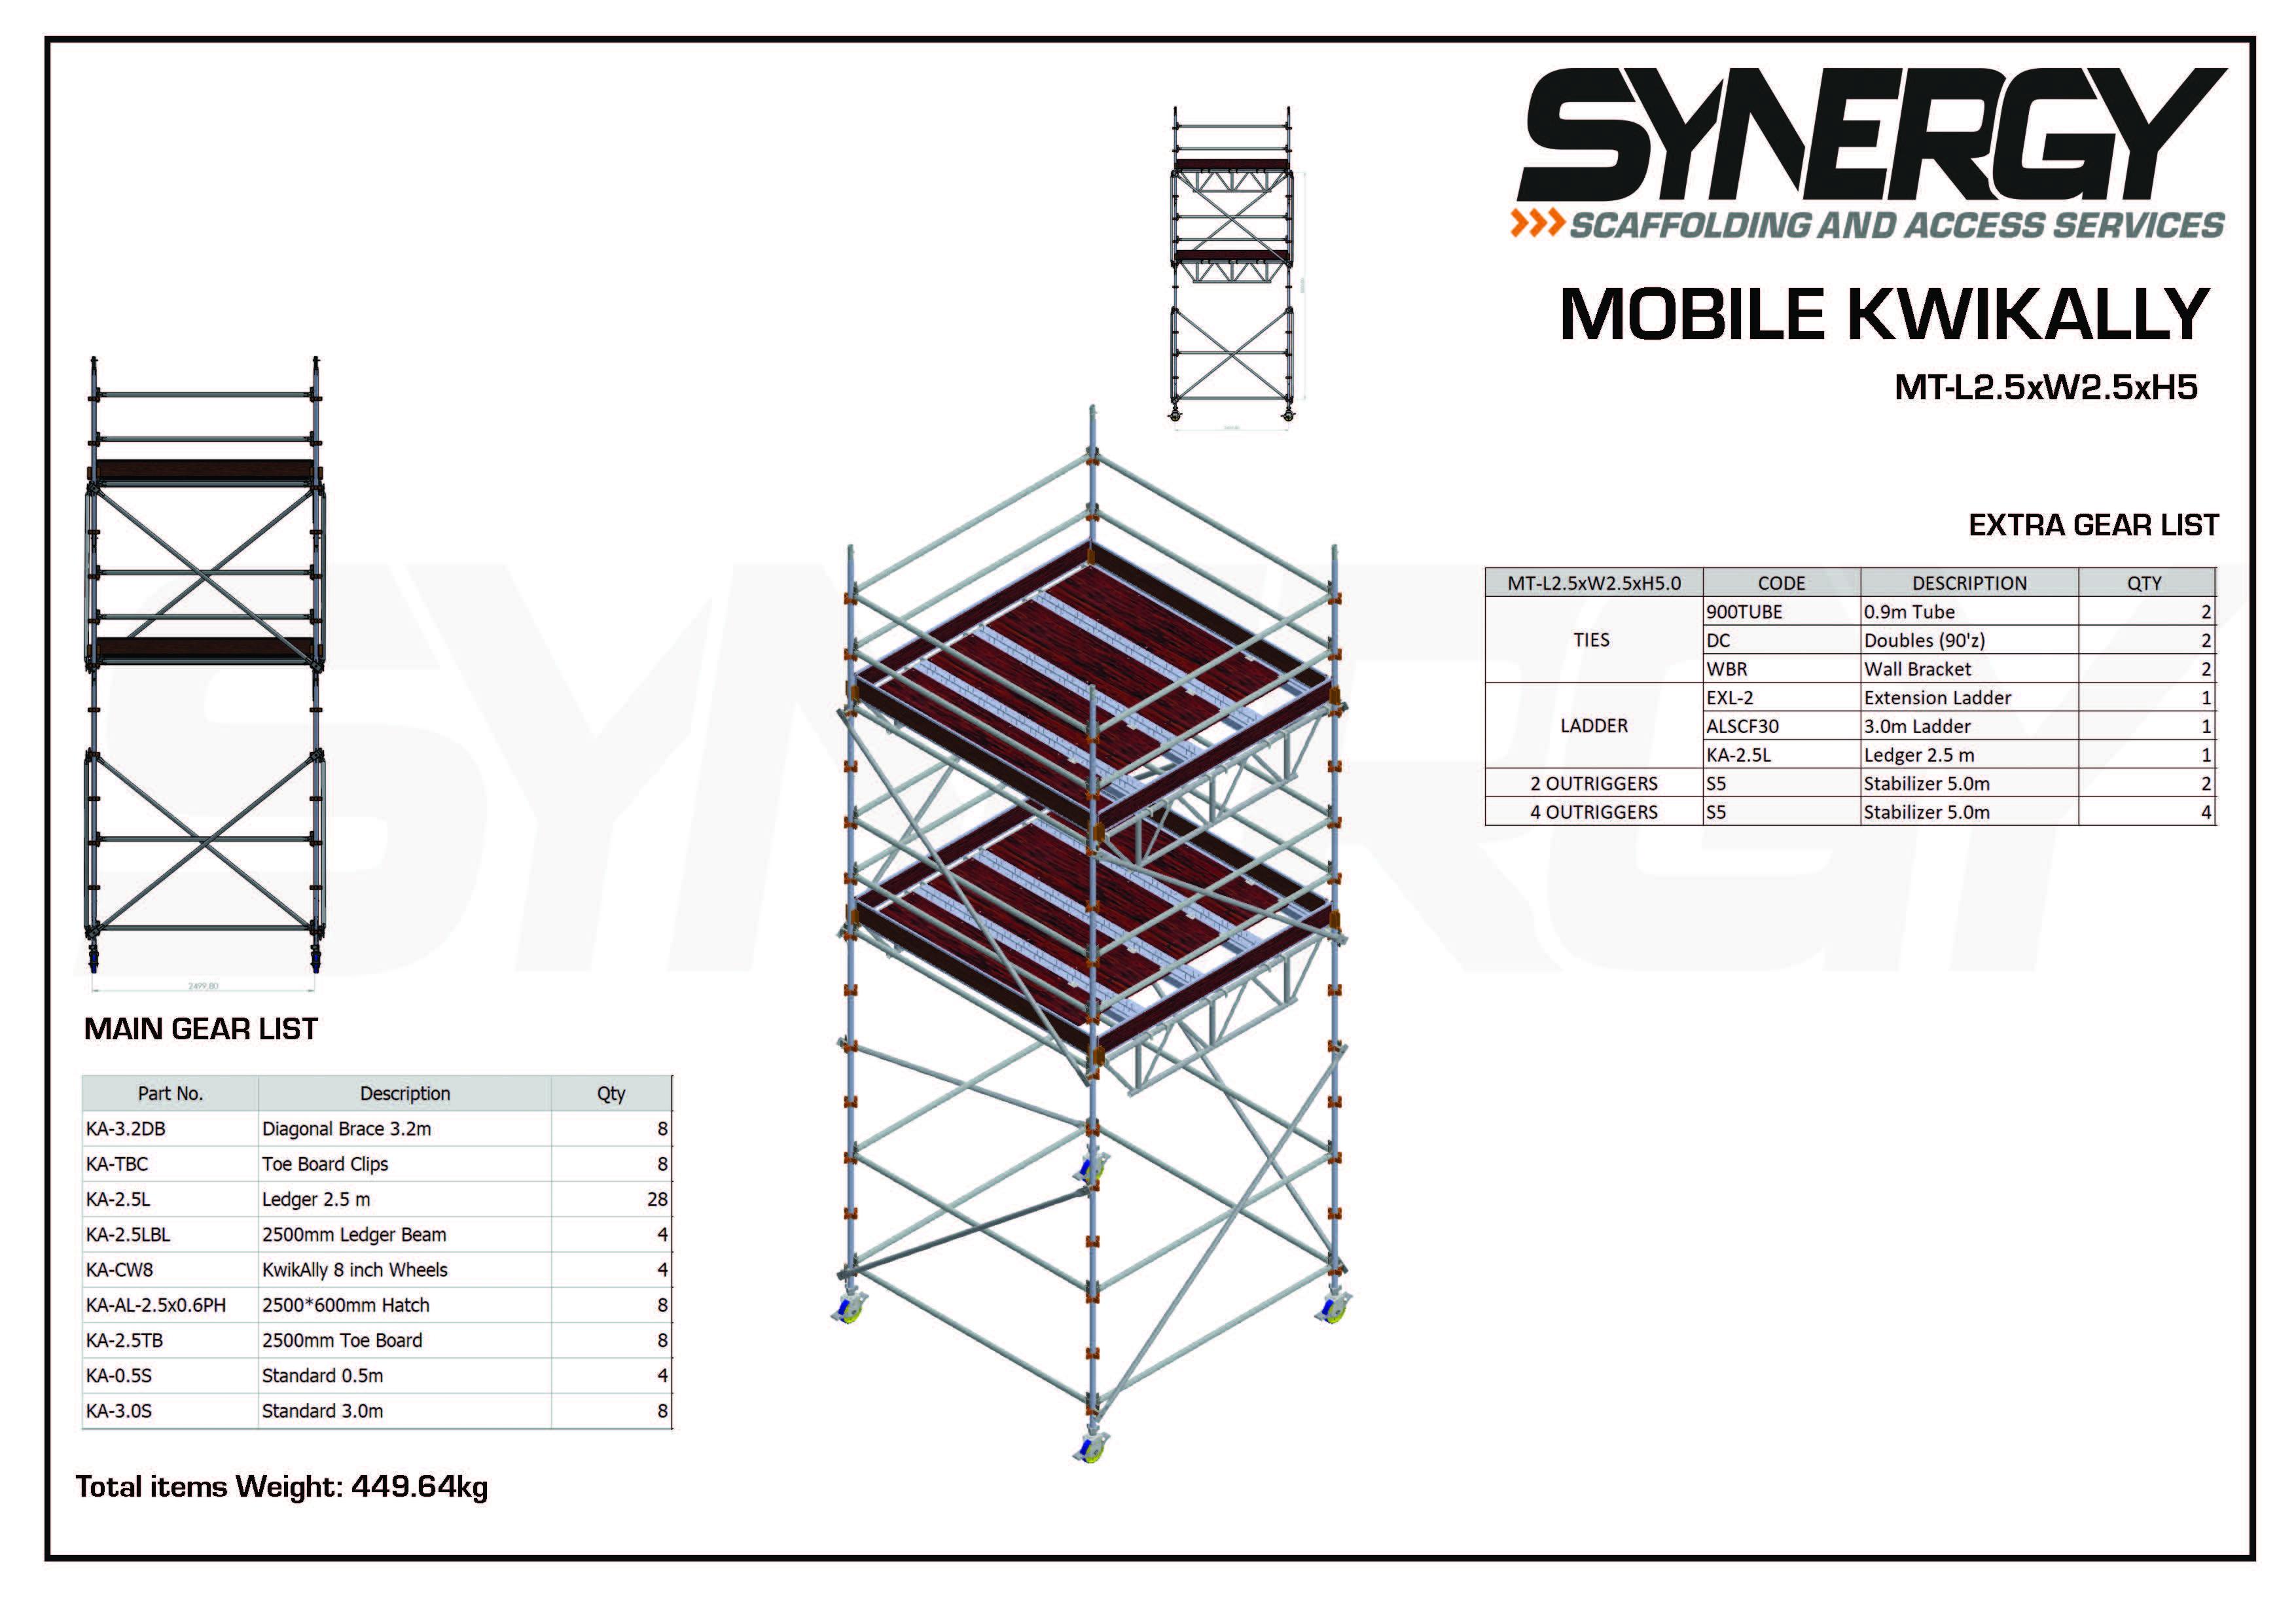 Kwikally Mobile 2.5m x 2.5m x 5m(Height)